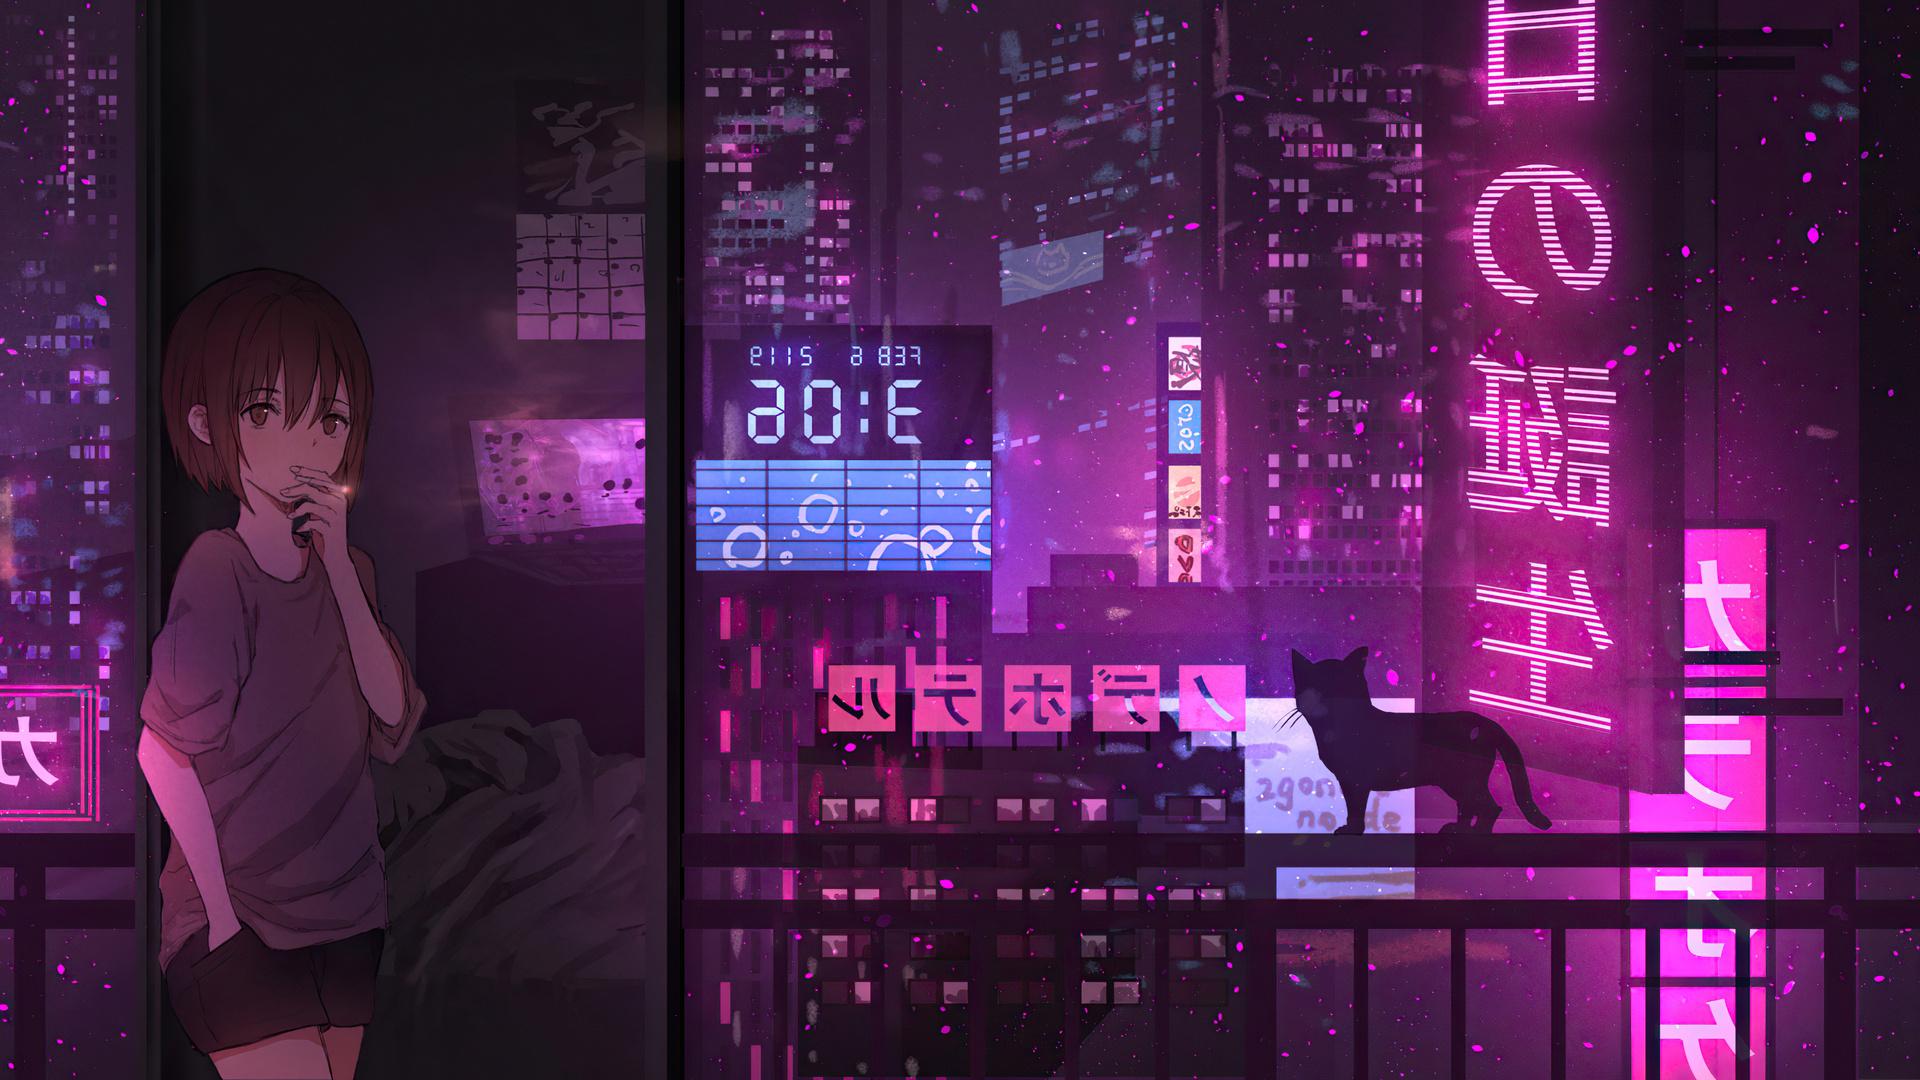 1920x1080 Anime Girl City Night Neon Cyberpunk 4k Laptop ...